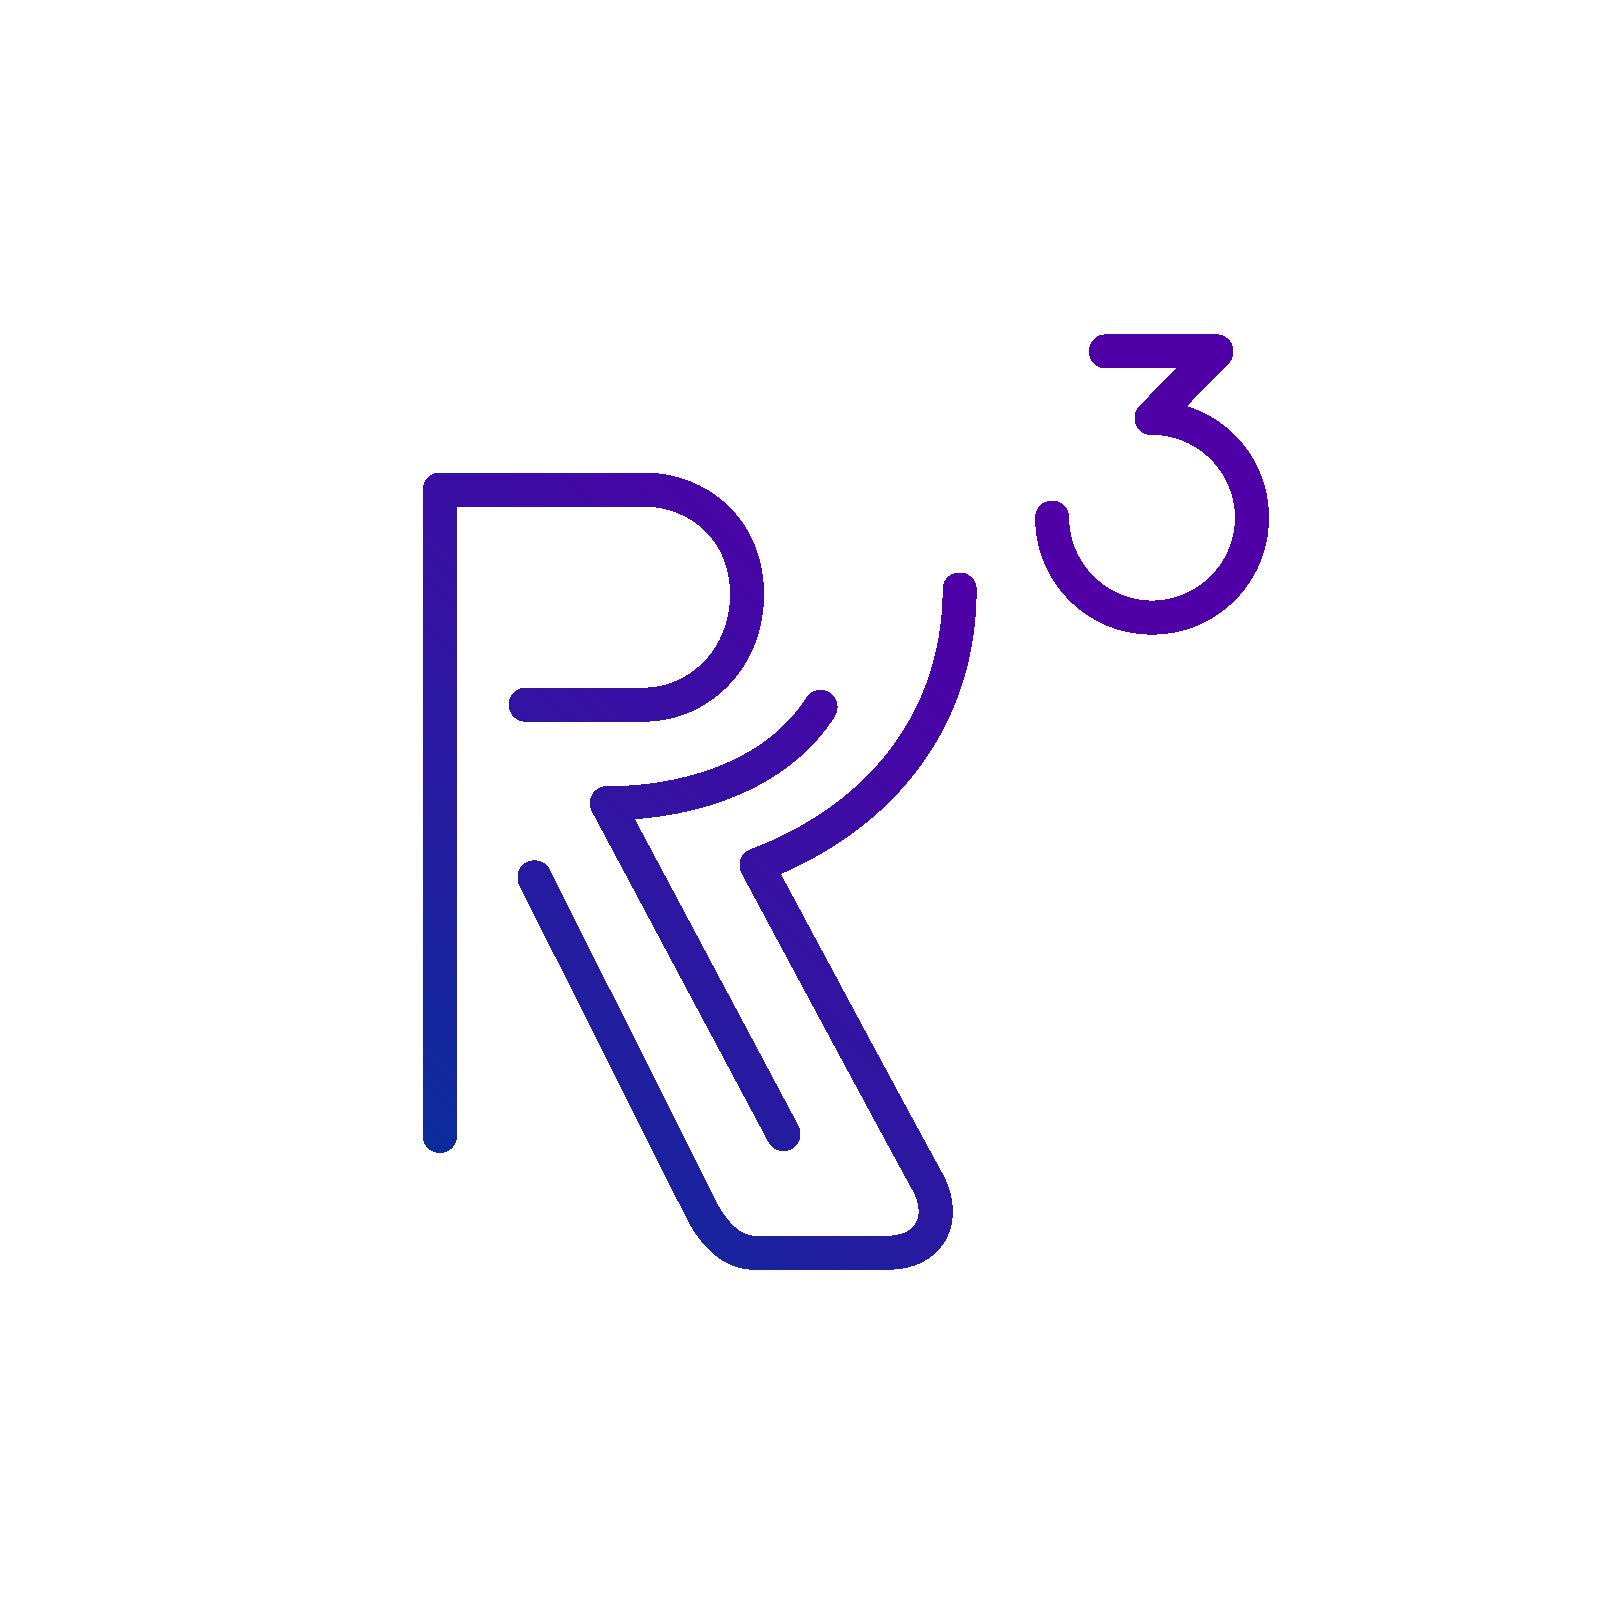 R3_logo_icon_gradient_indigo.png